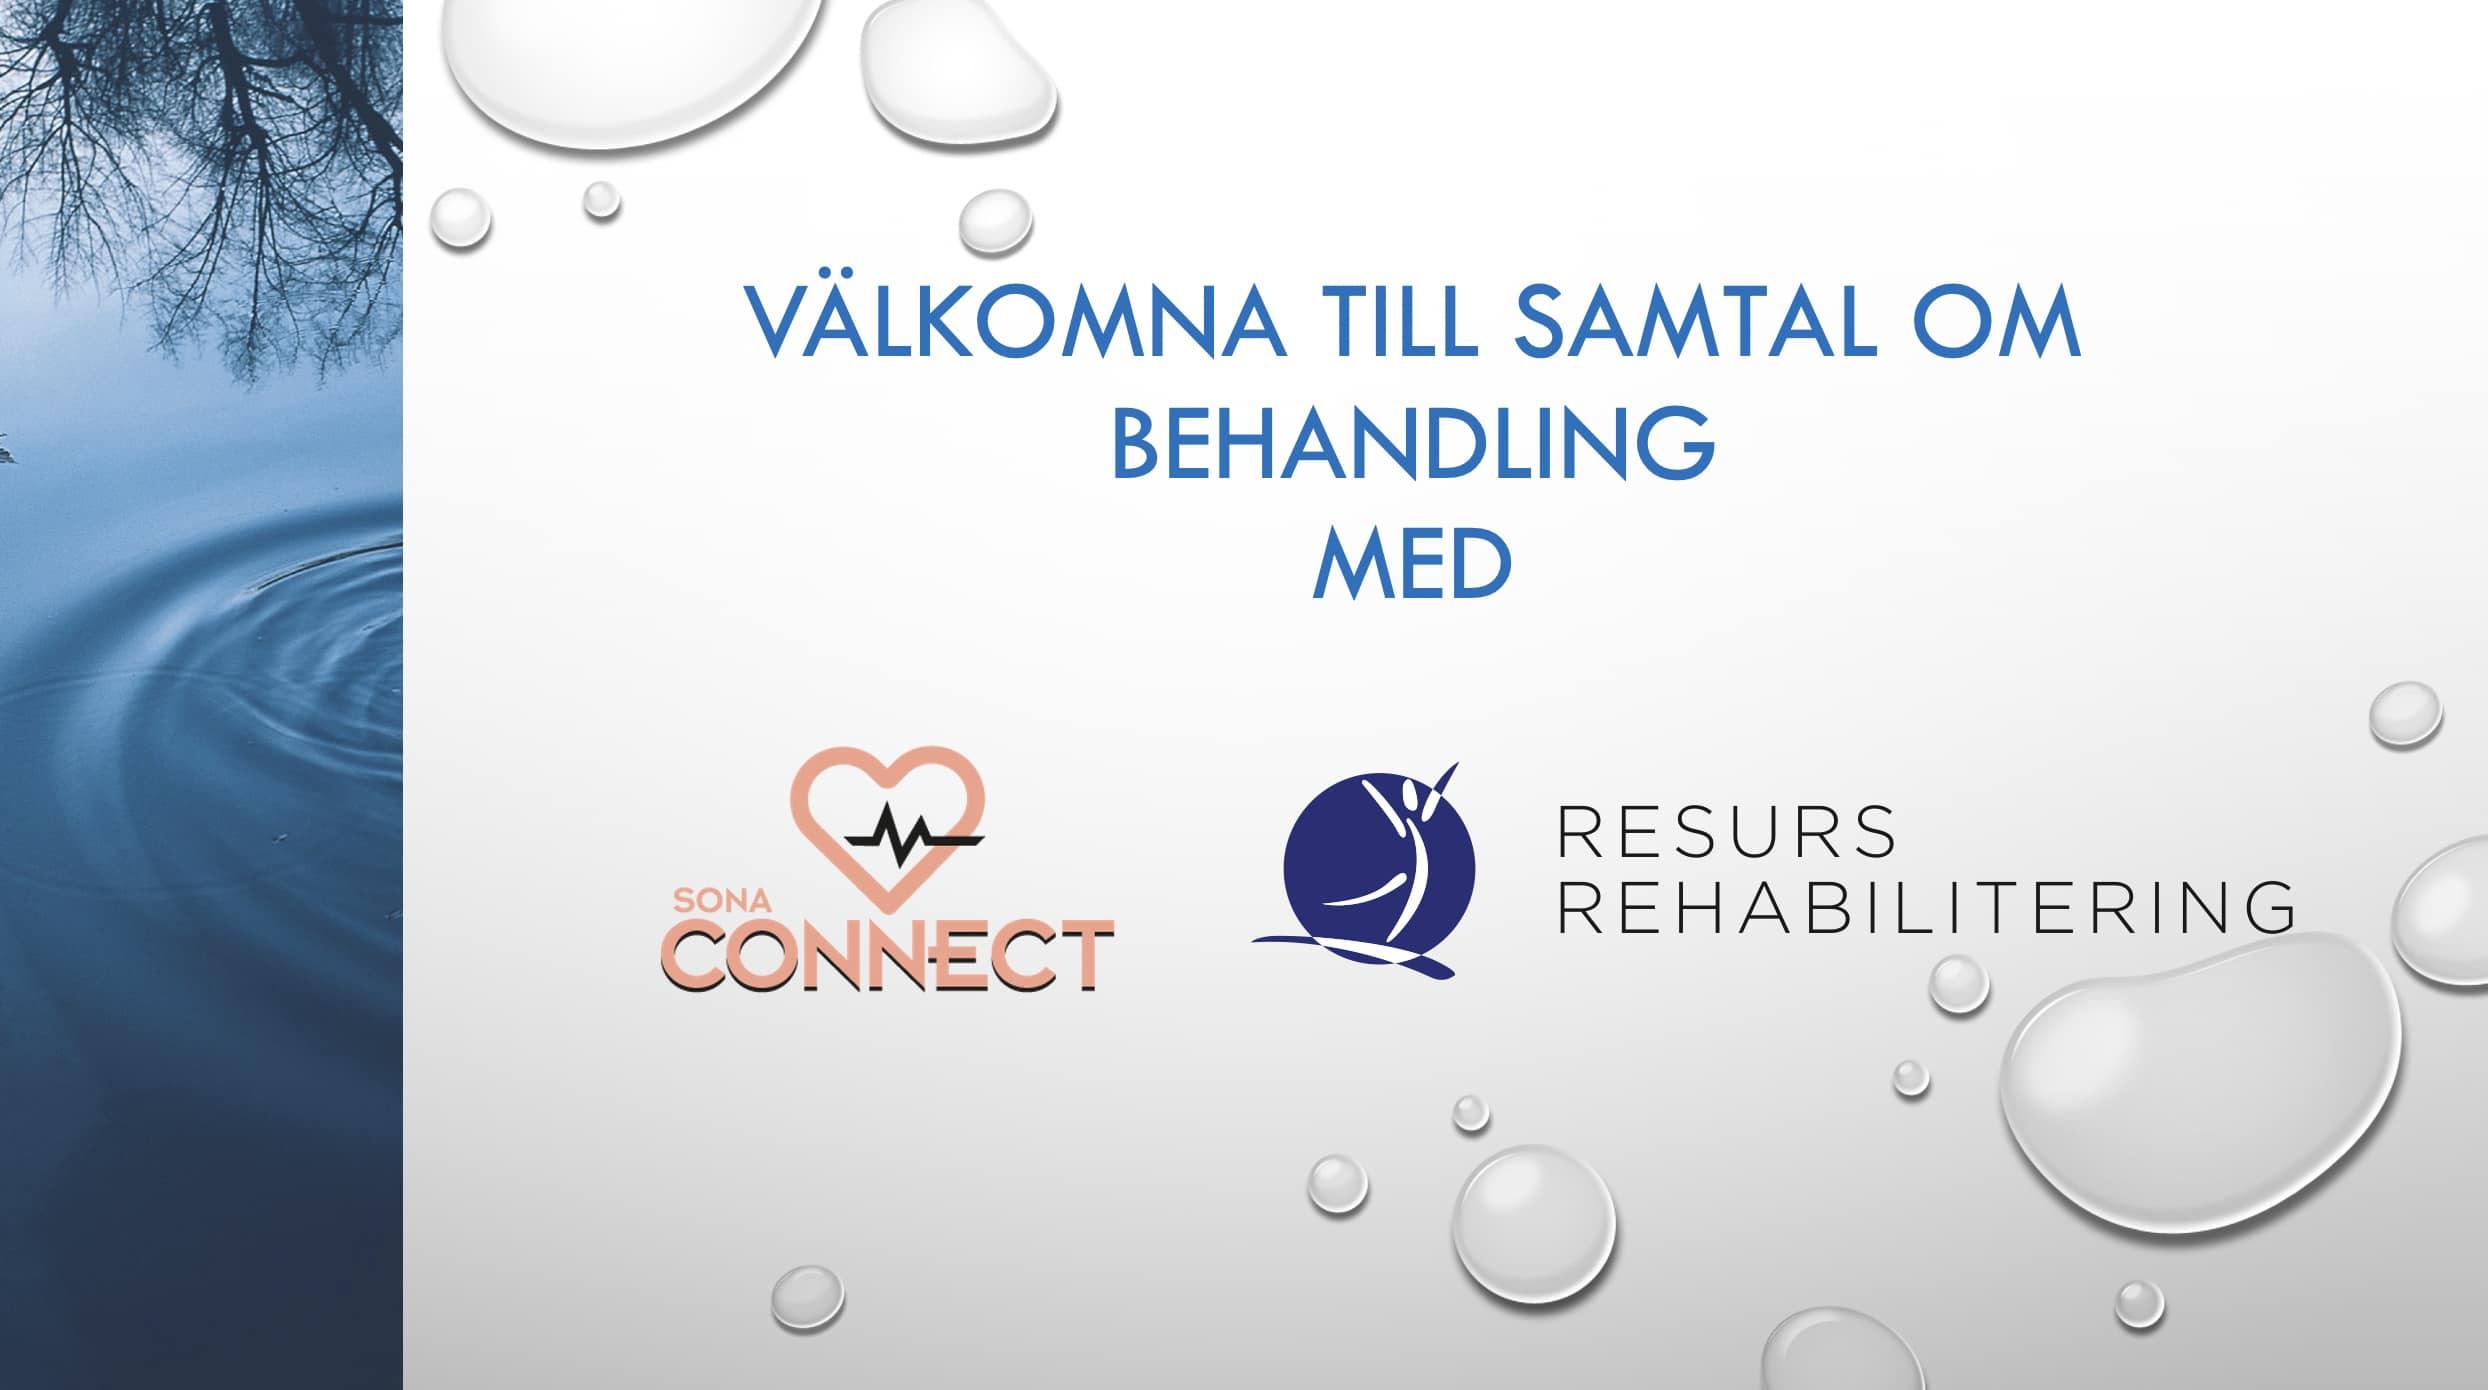 SONA Connect Resurs Rehabilitering